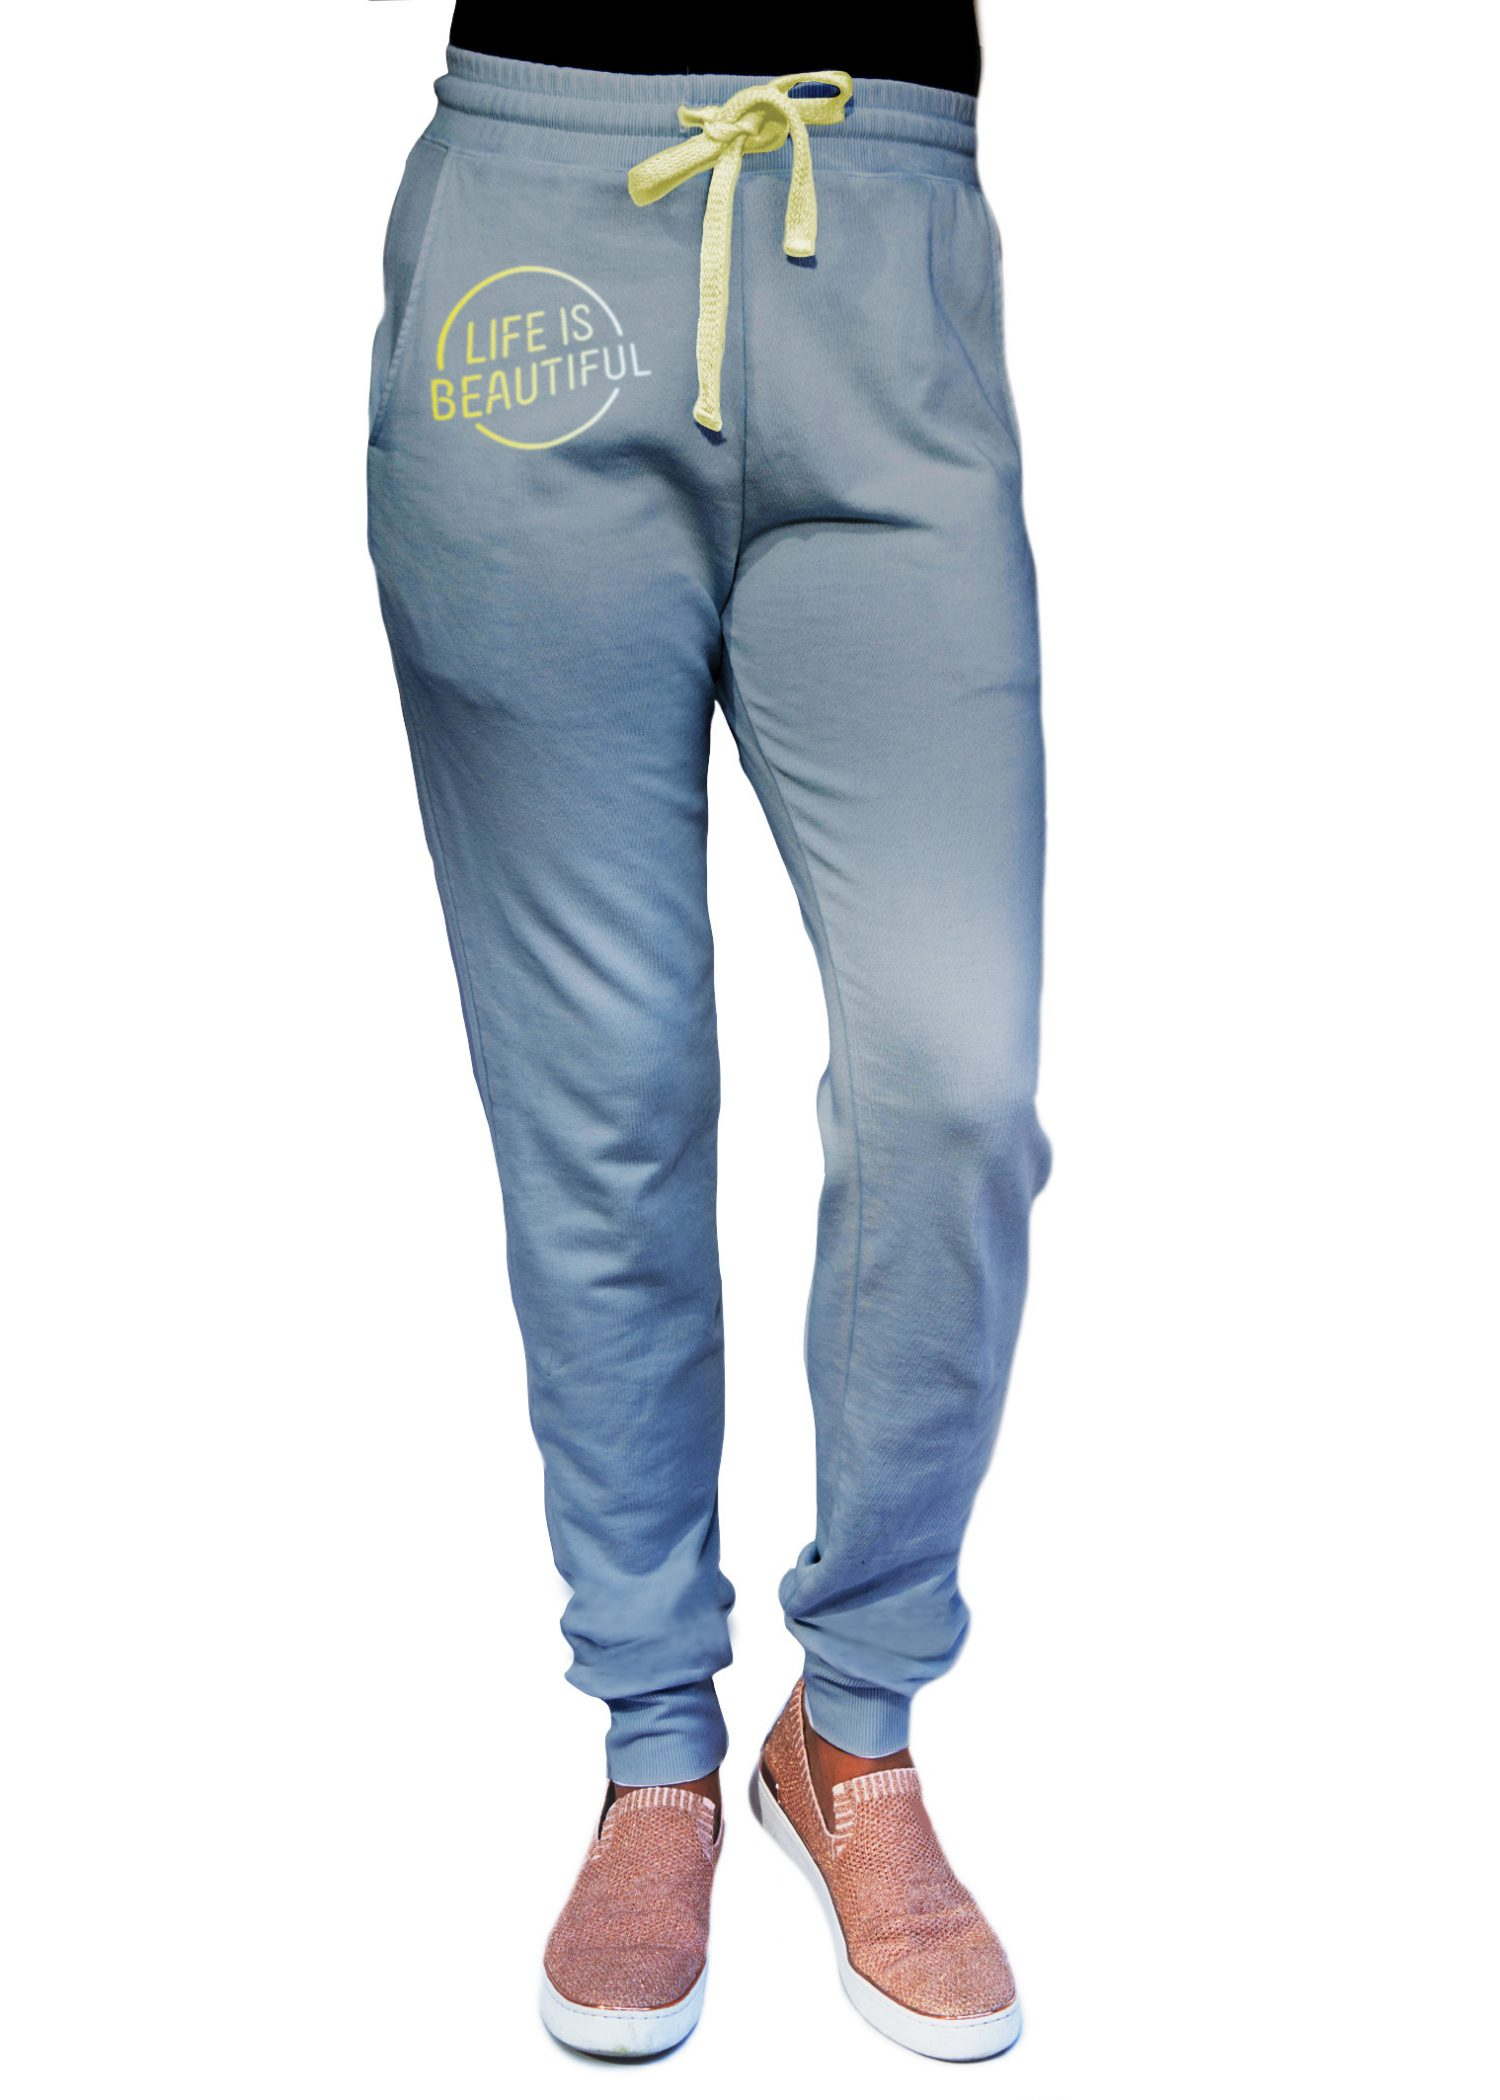 GG 311-FT unisex jogger-front lt blue LIB